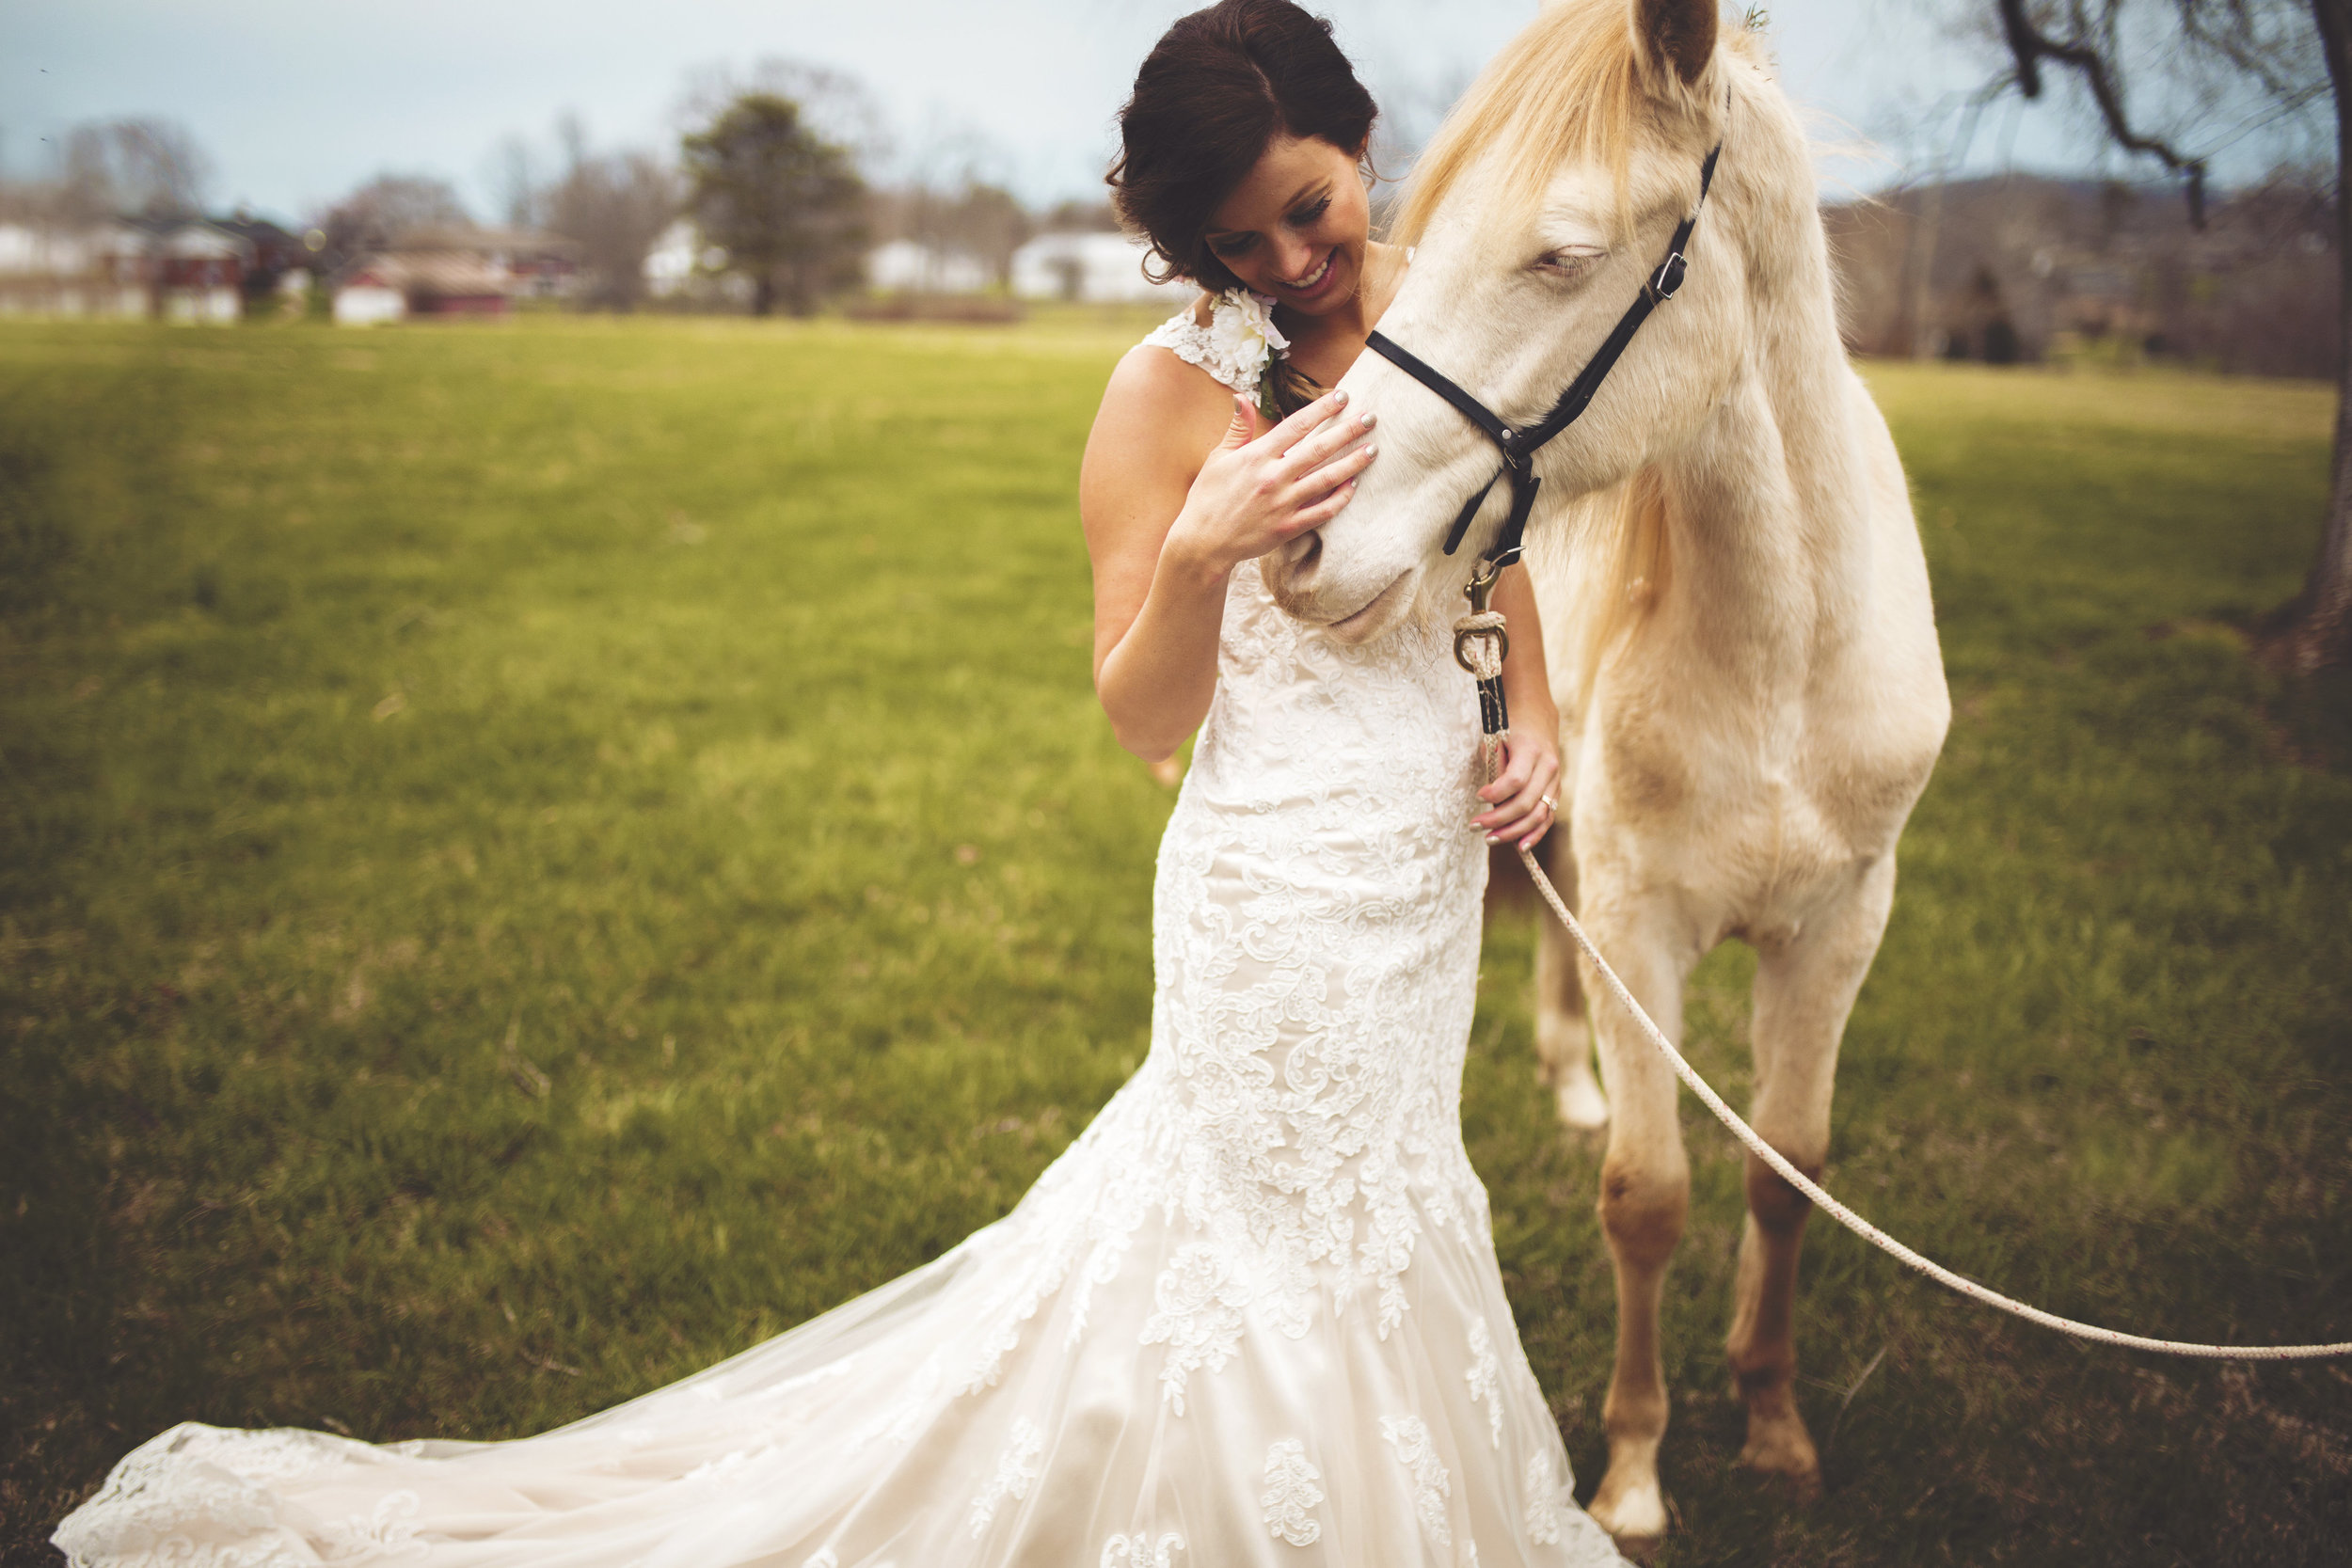 styled bridal session-styled bridal session-0051.jpg